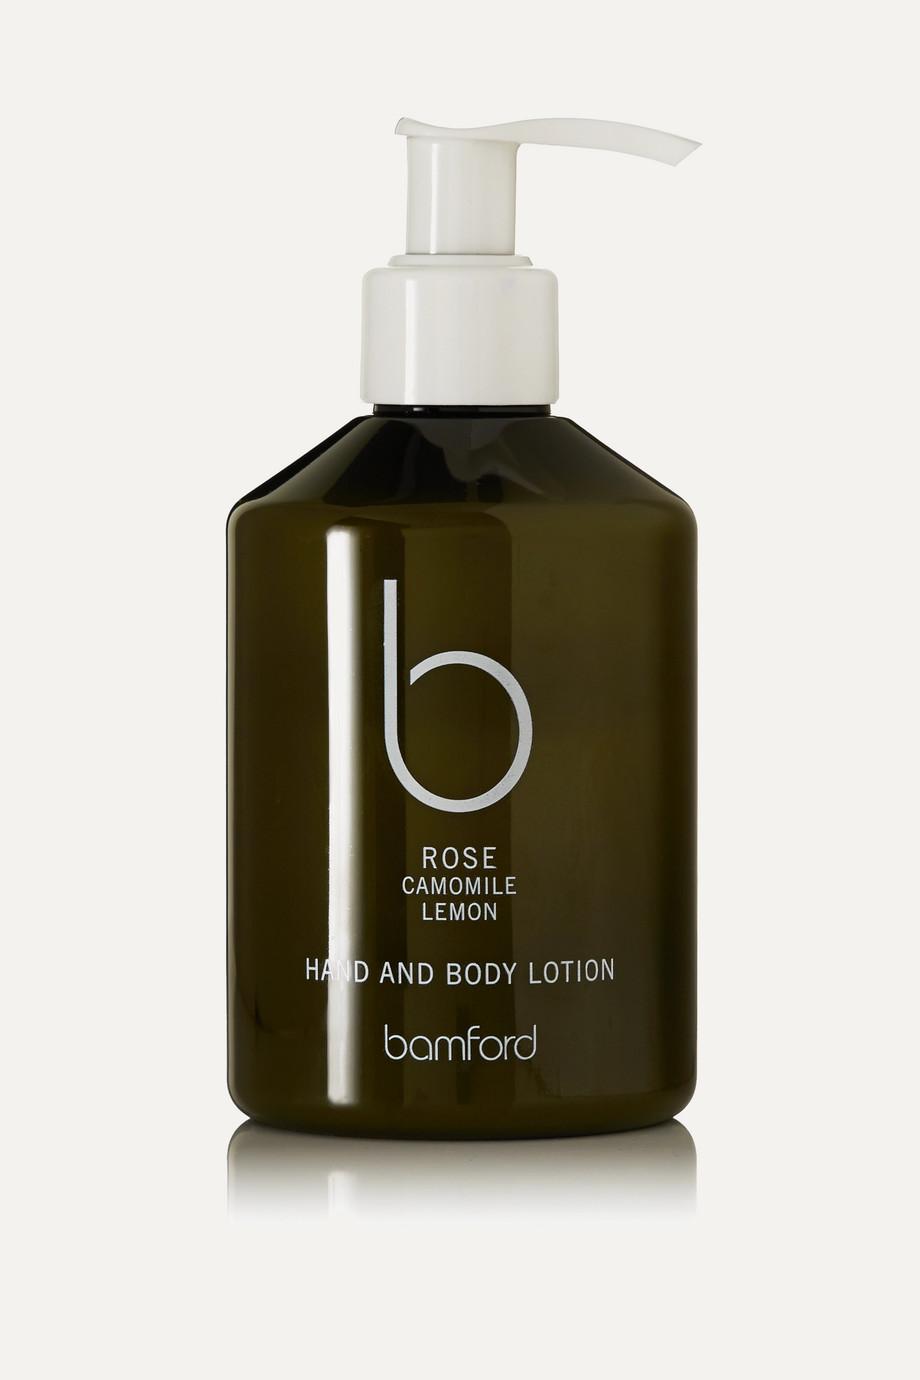 Bamford 玫瑰花香手部和身体乳液,250ml